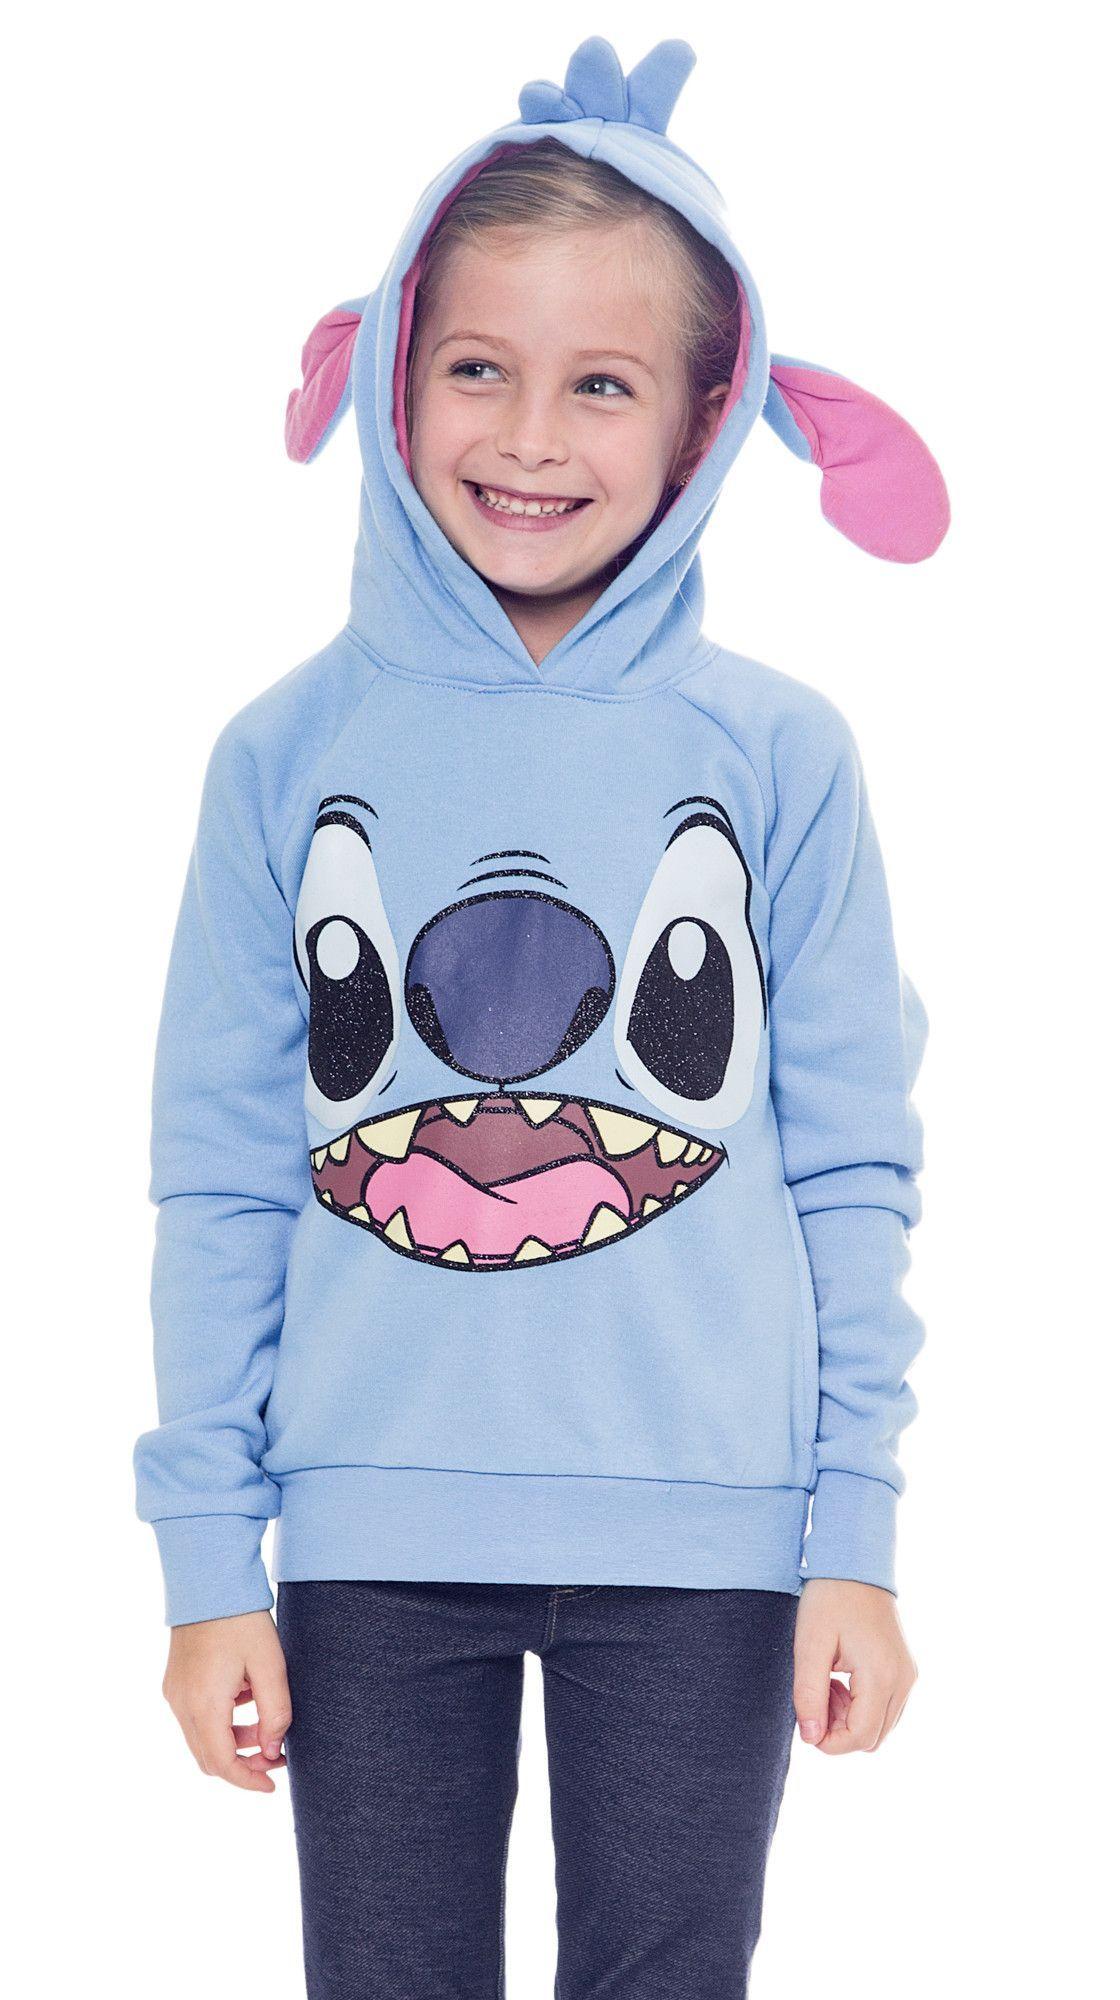 683a6939722d Disney Stitch Costume Sweatshirt Hoodie with Ears Blue | halloween ...